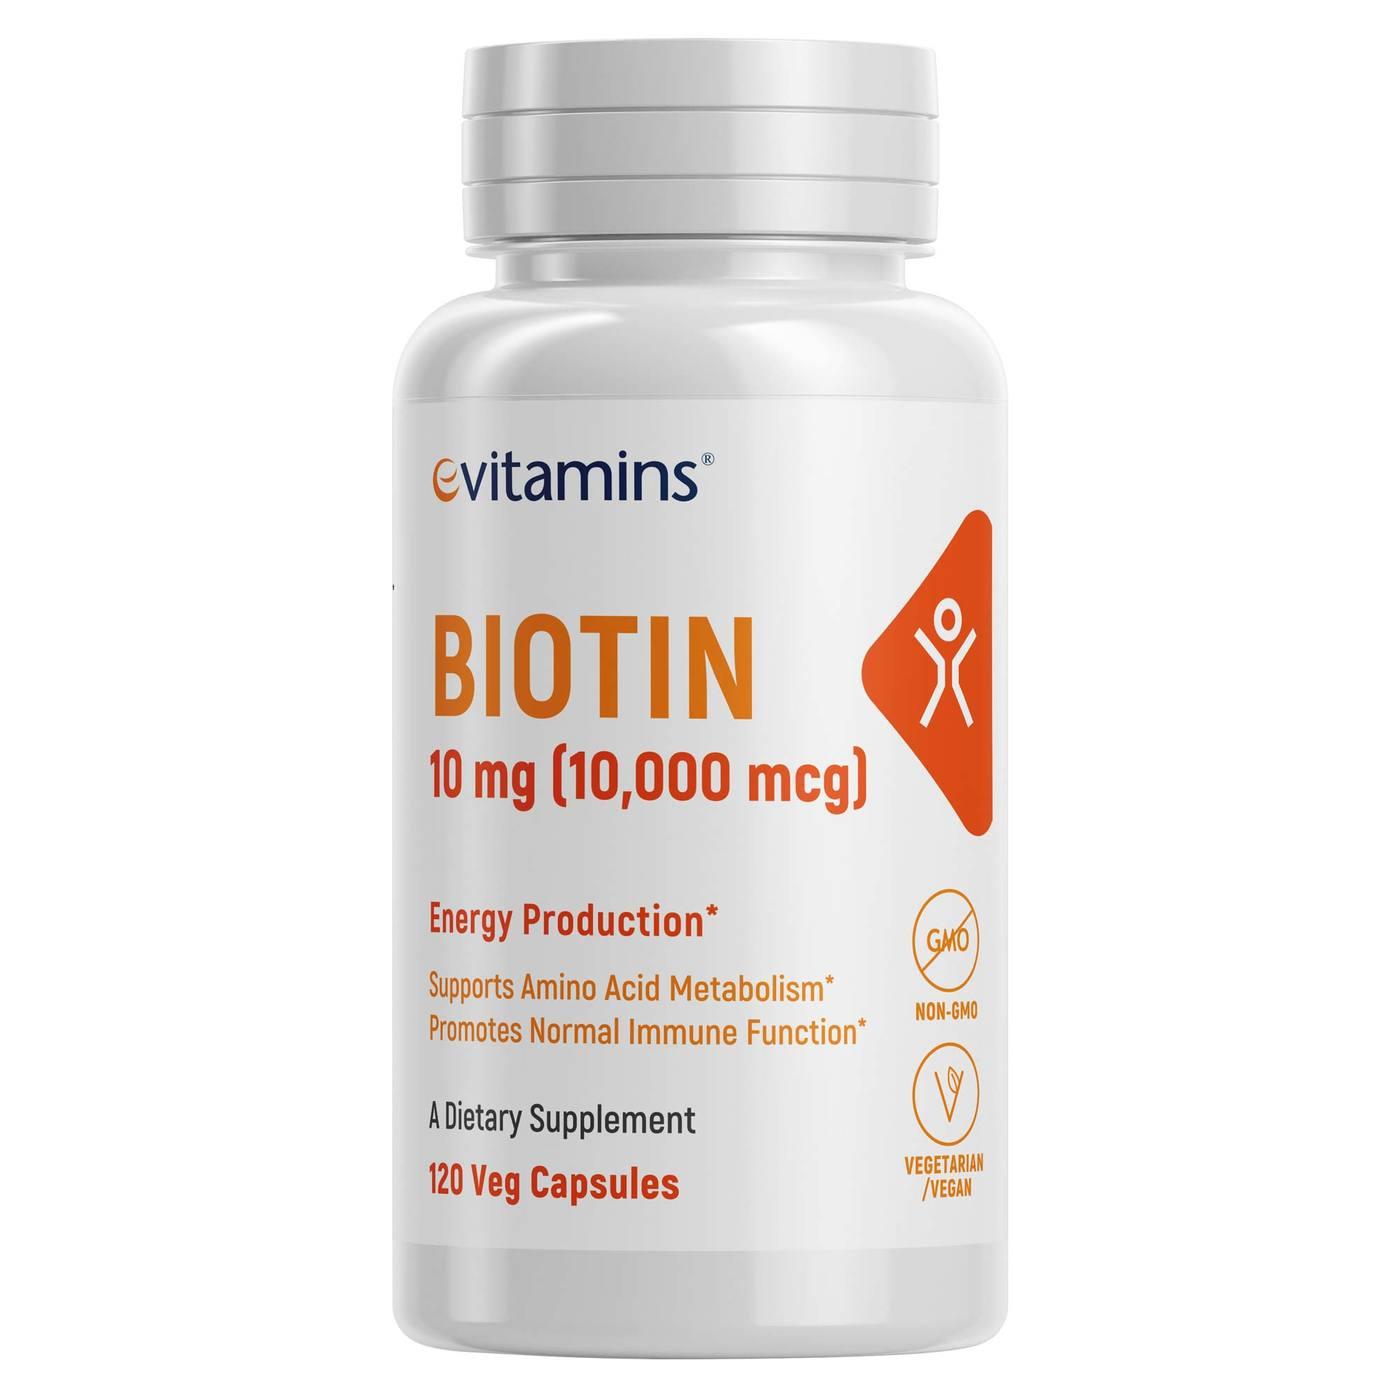 Evitamins Extra Strength Biotin Vegetarian Non Gmo 10000 Mcg 100 Tablets Natrol Hover To Zoom